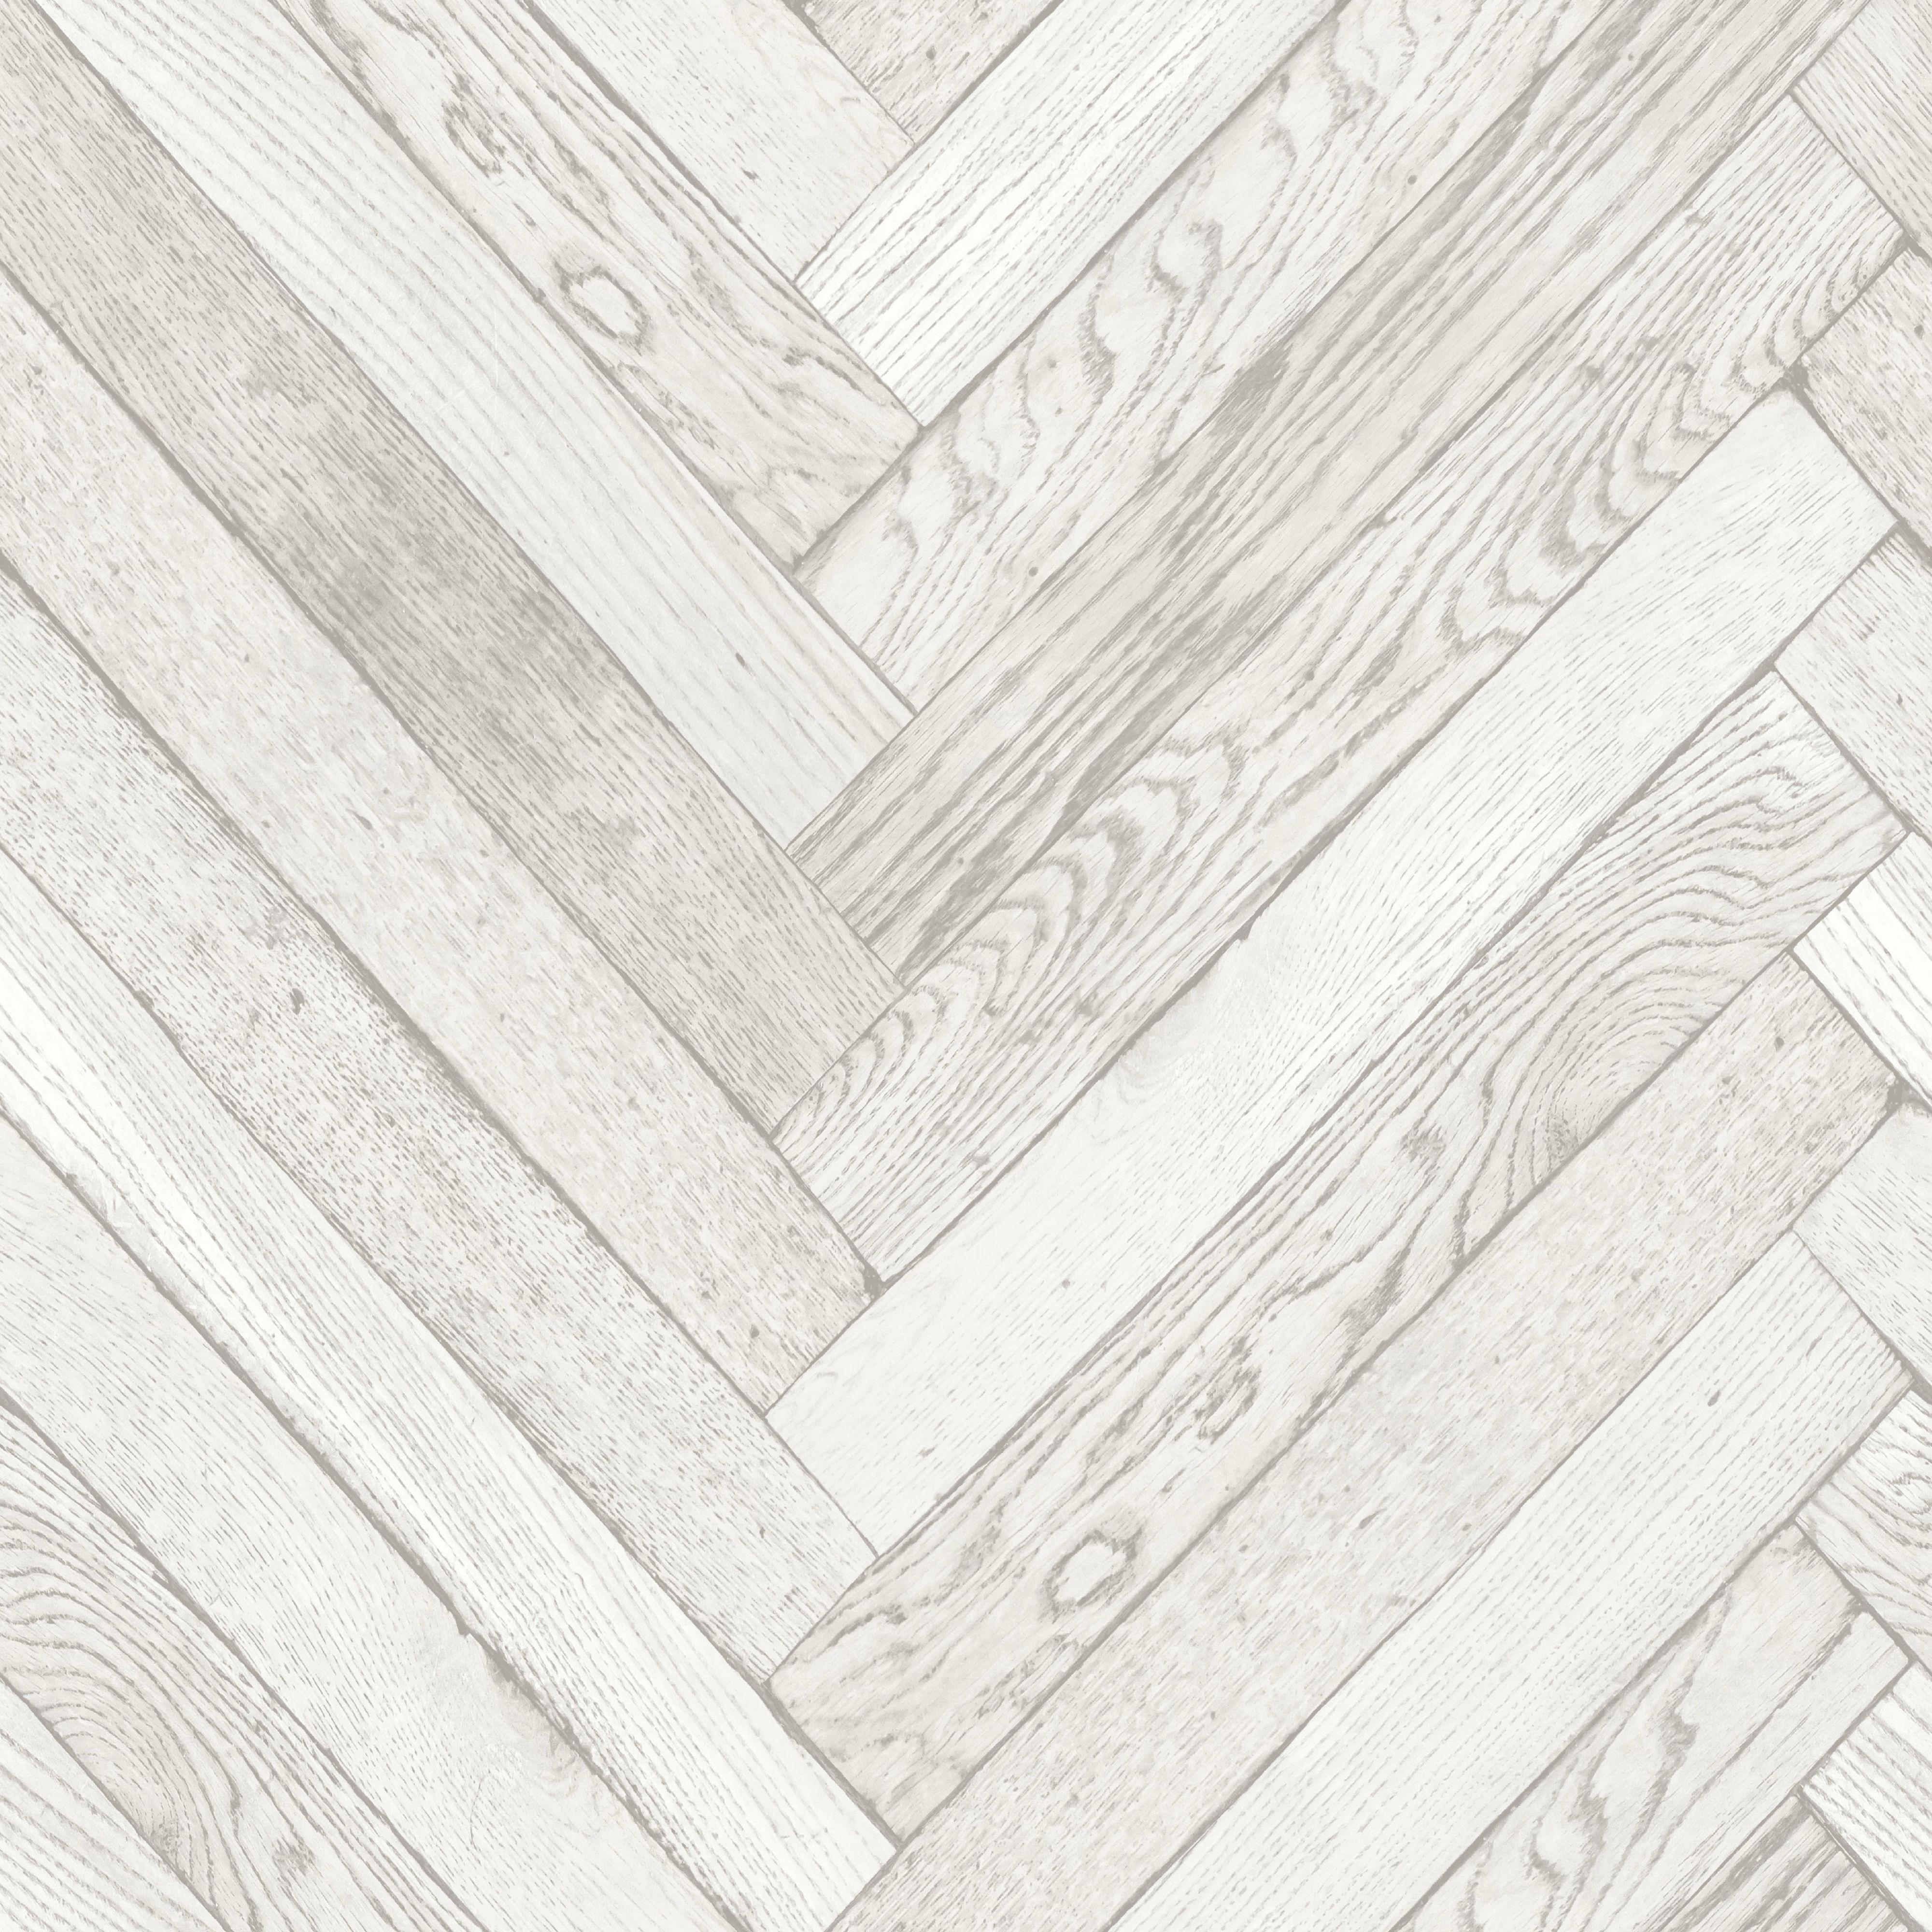 Parquet Wood Plank White Wallpaper